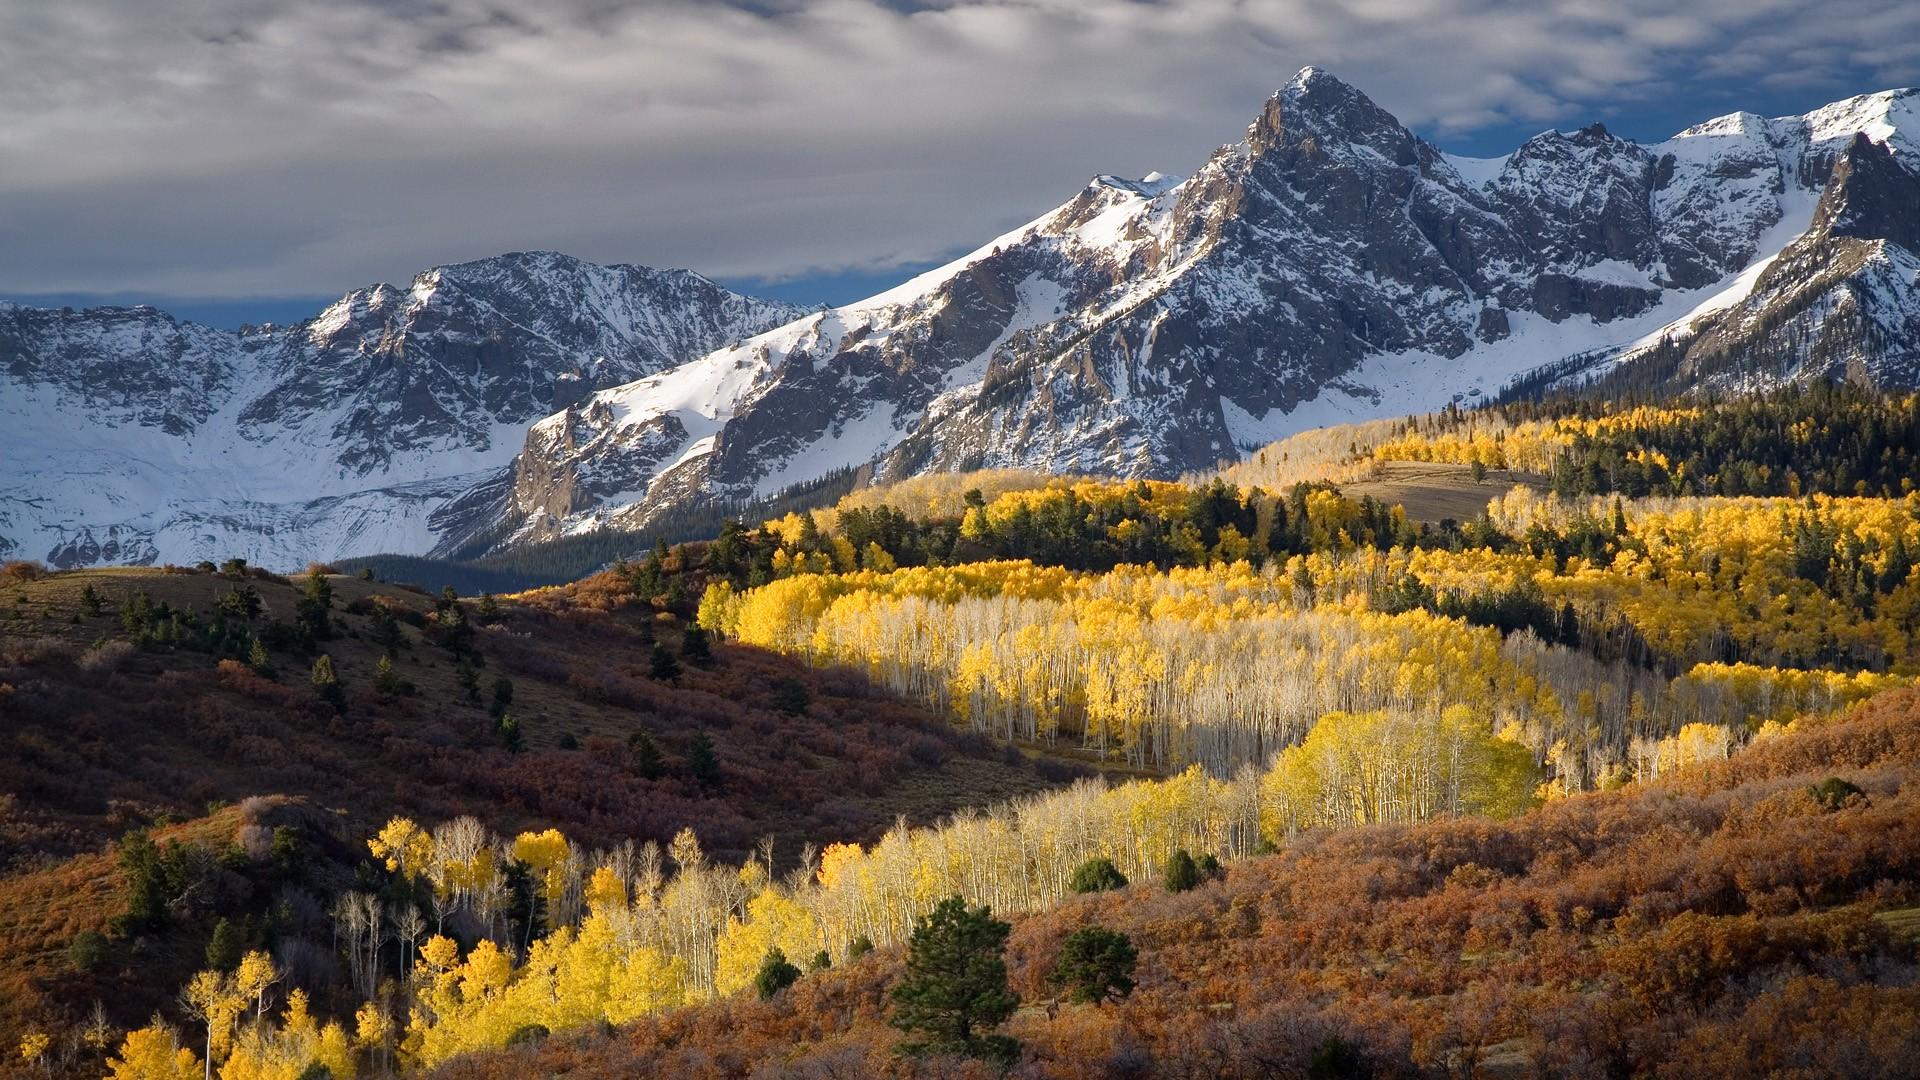 Fall Foliage Iphone Wallpaper Colorado Wallpapers Hd Pixelstalk Net